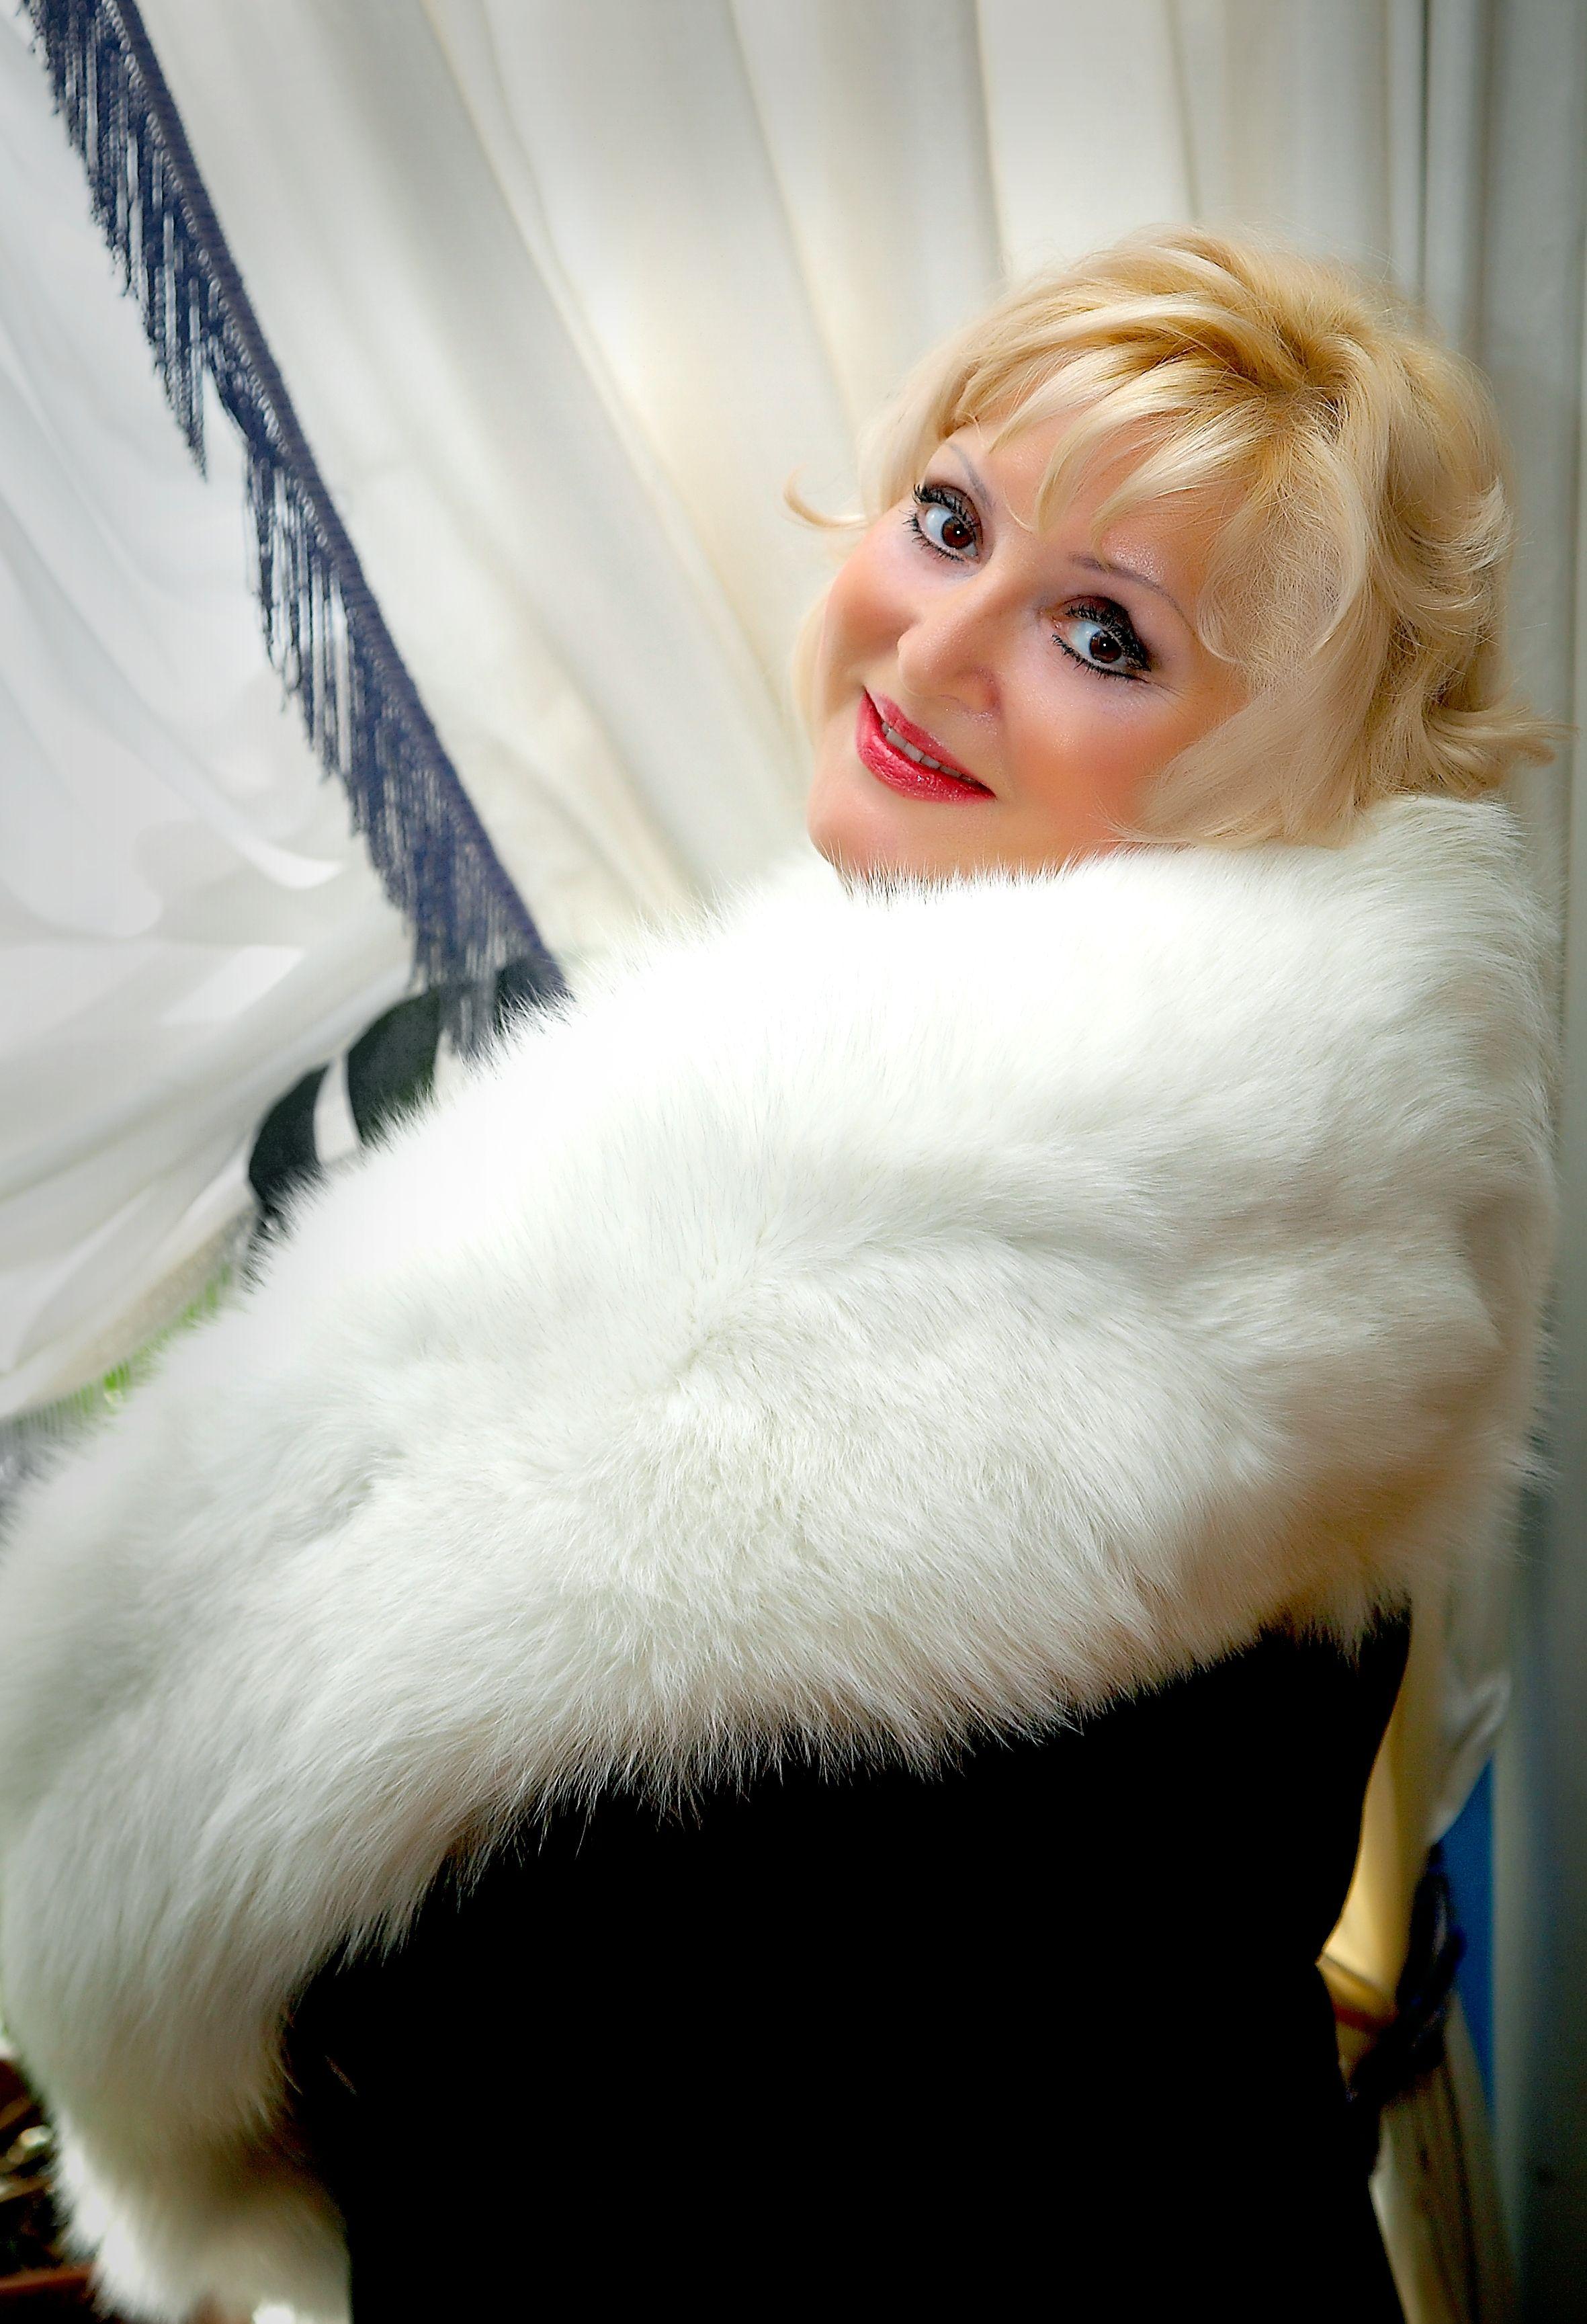 Reizvolle Frau im Pelz stockbild. Bild von lang, haltung